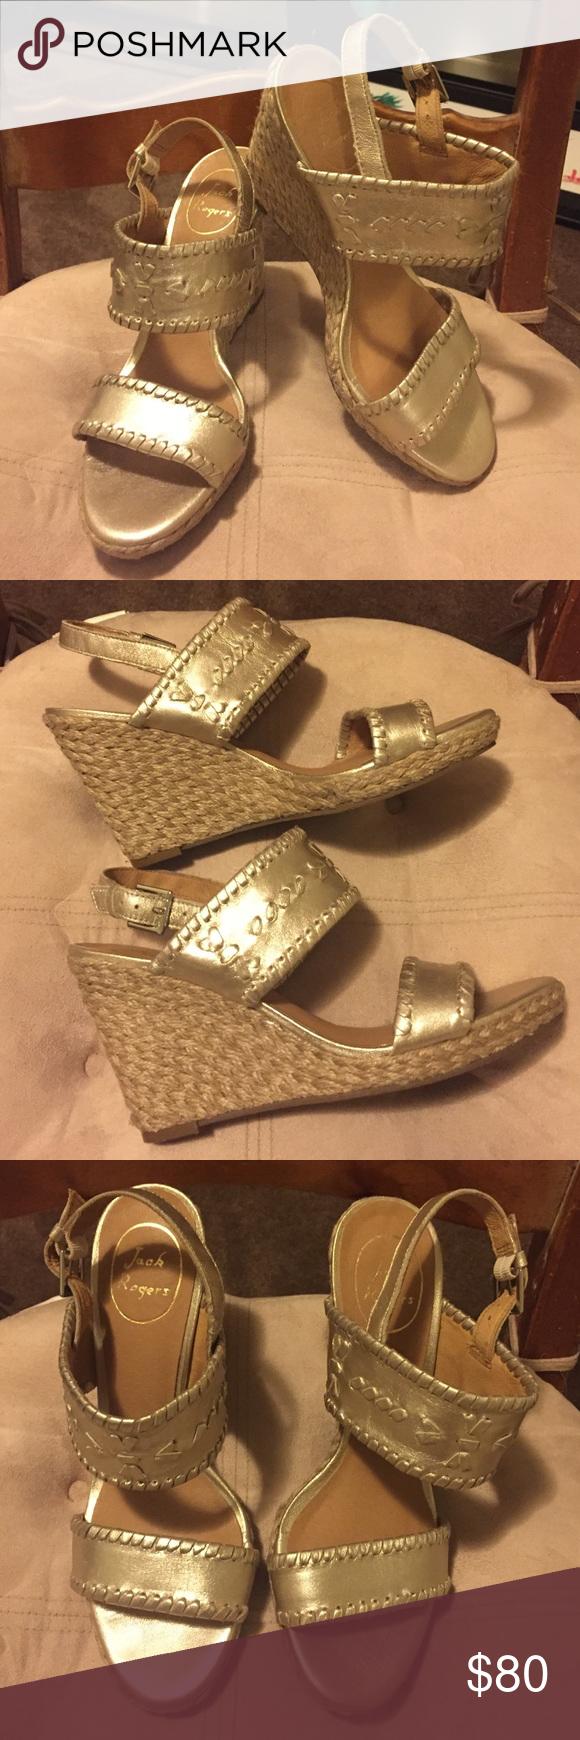 Jack Rogers Gold Vanessa Wedge Heels size 7M Jack Rogers Gold Vanessa Wedge Heels size 7M. Great Wedge Heels. 3.5 inch heels. Comfortable and classy!! Jack Rogers Shoes Wedges